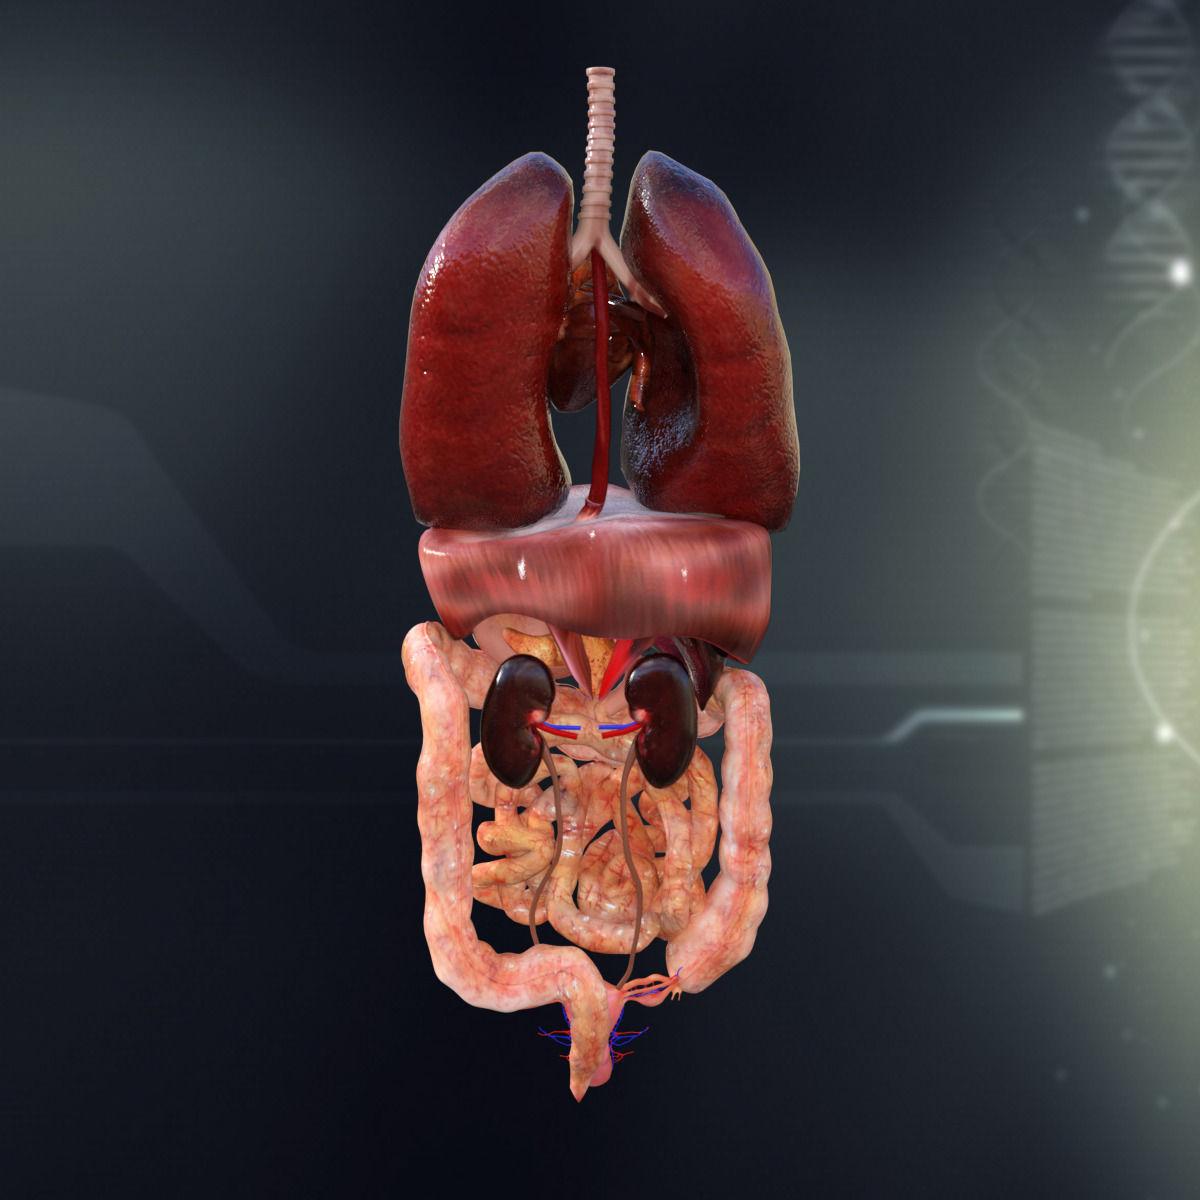 interior female body parts diagram » Electronic Wallpaper ...